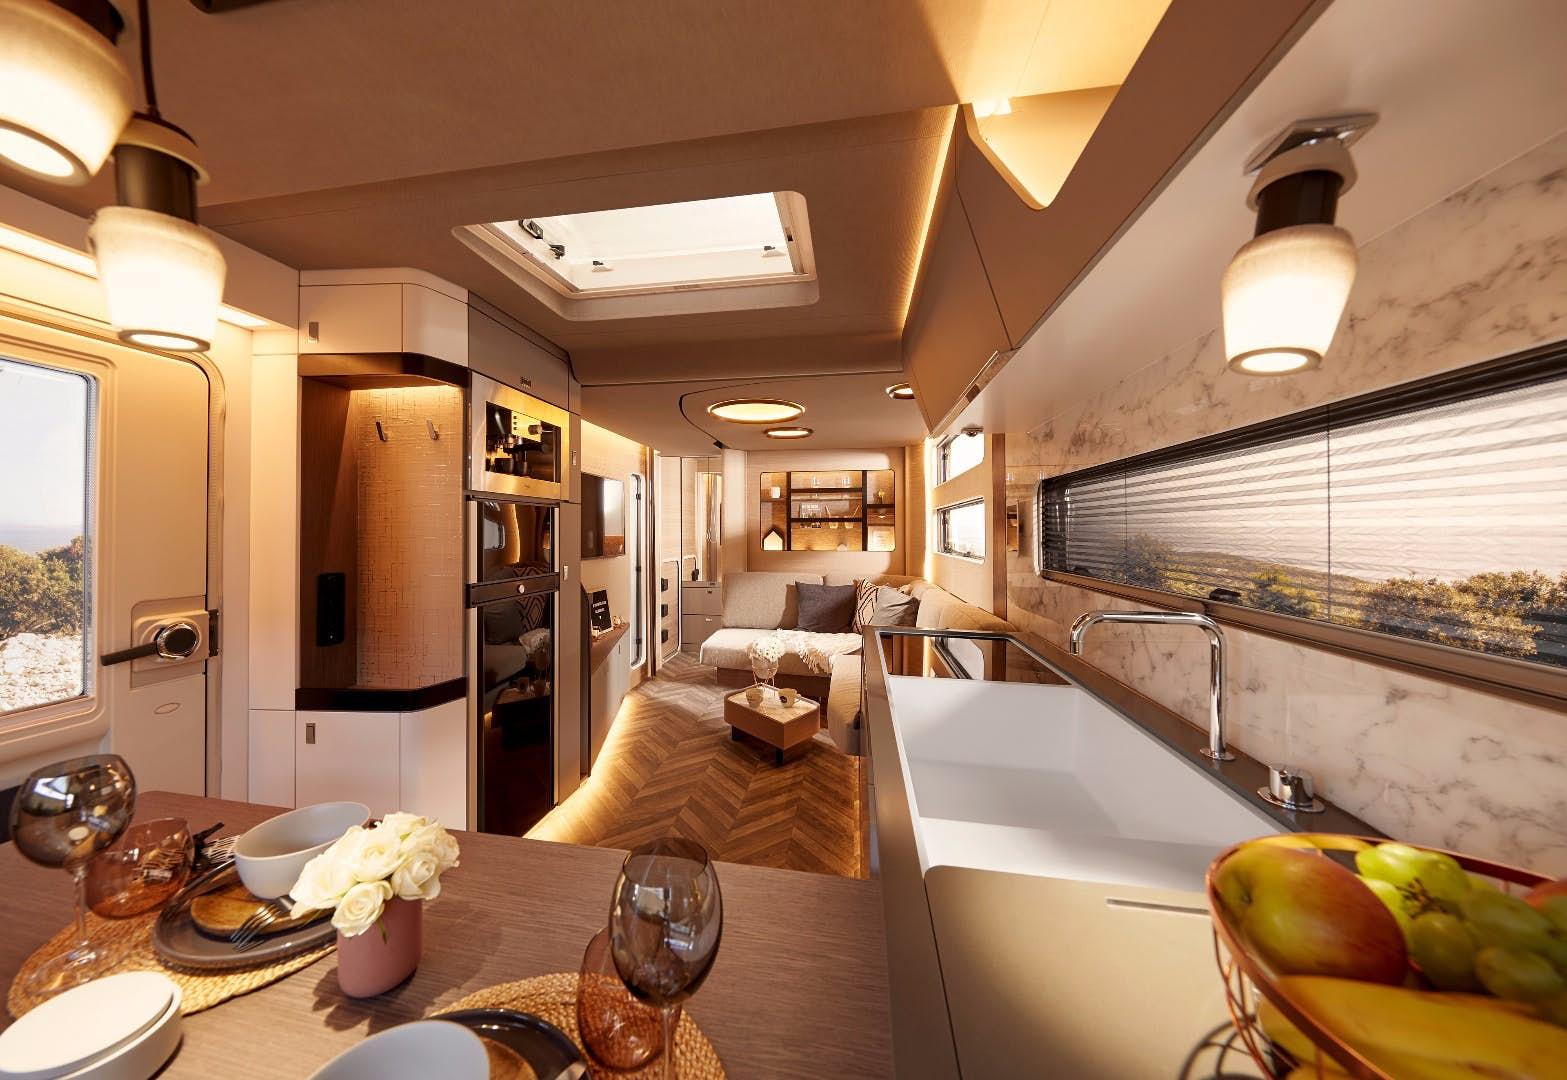 Chic camper-trailer includes drop-down queen bed